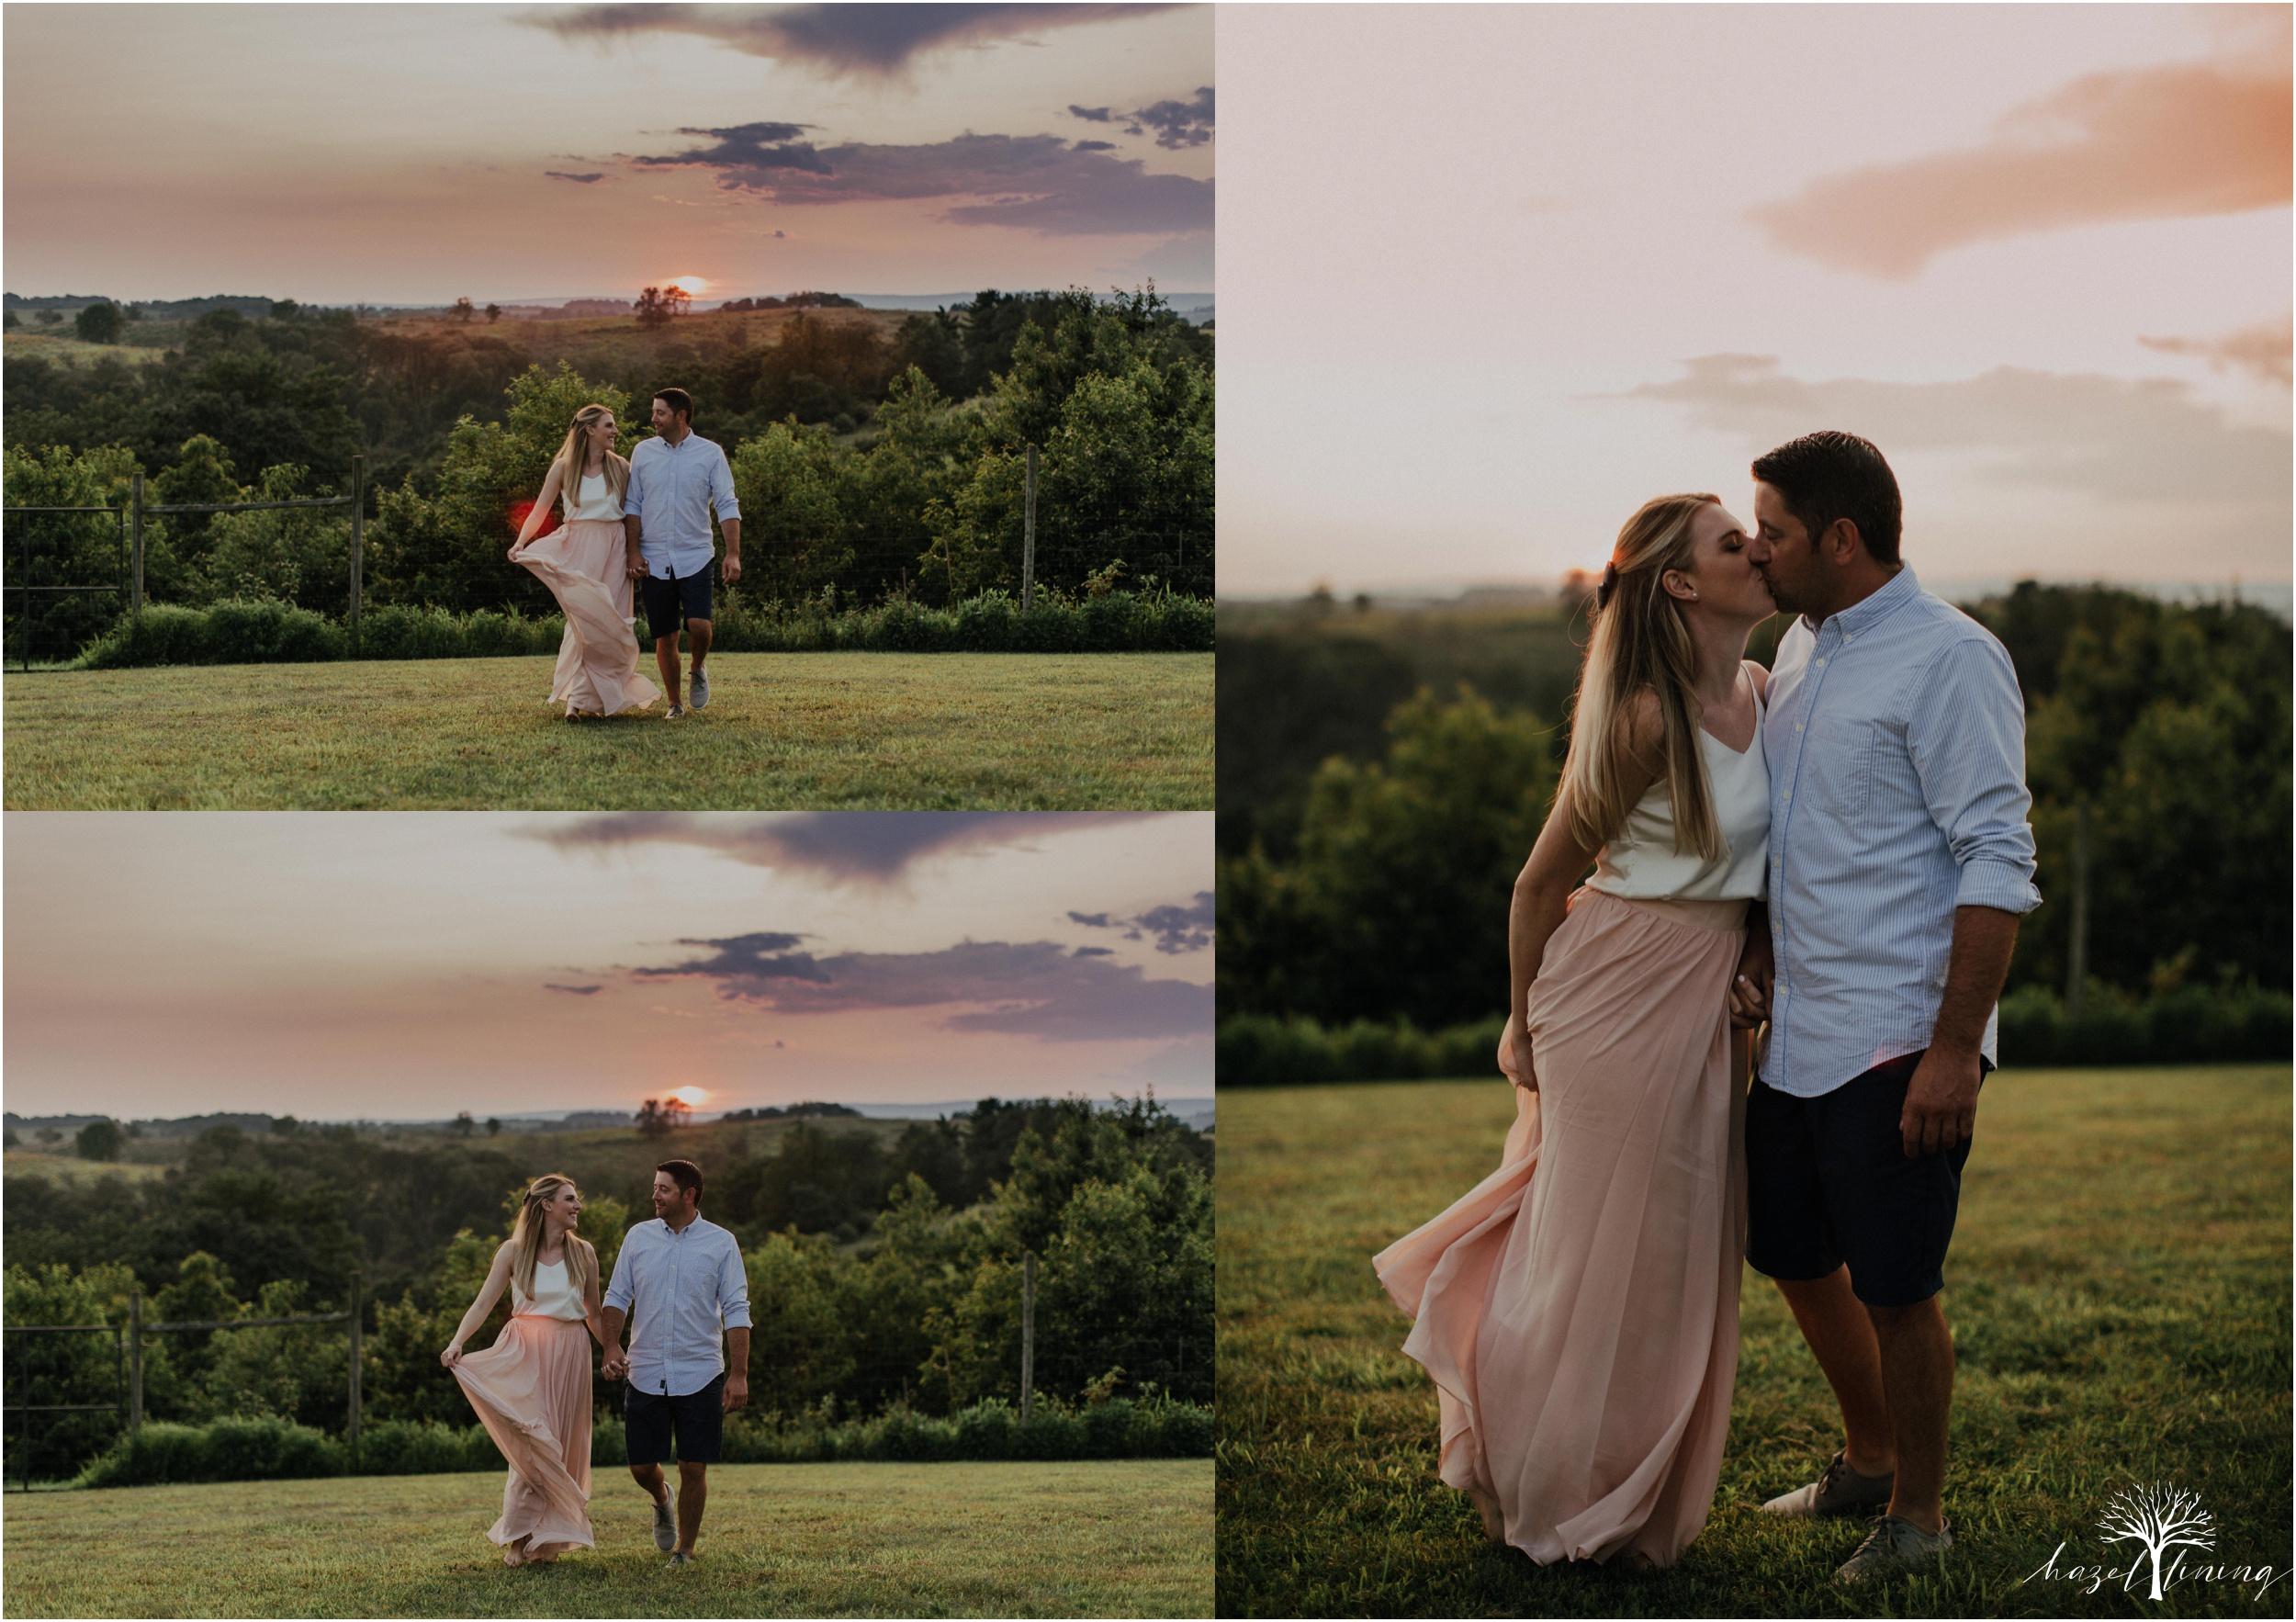 ashley-fillmore-steve-reimer-trexler-nature-preserve-summer-engagement-session-schnecksville-pennsylvania-hazel-lining-photography-destination-elopement-wedding-engagement-photography_0056.jpg